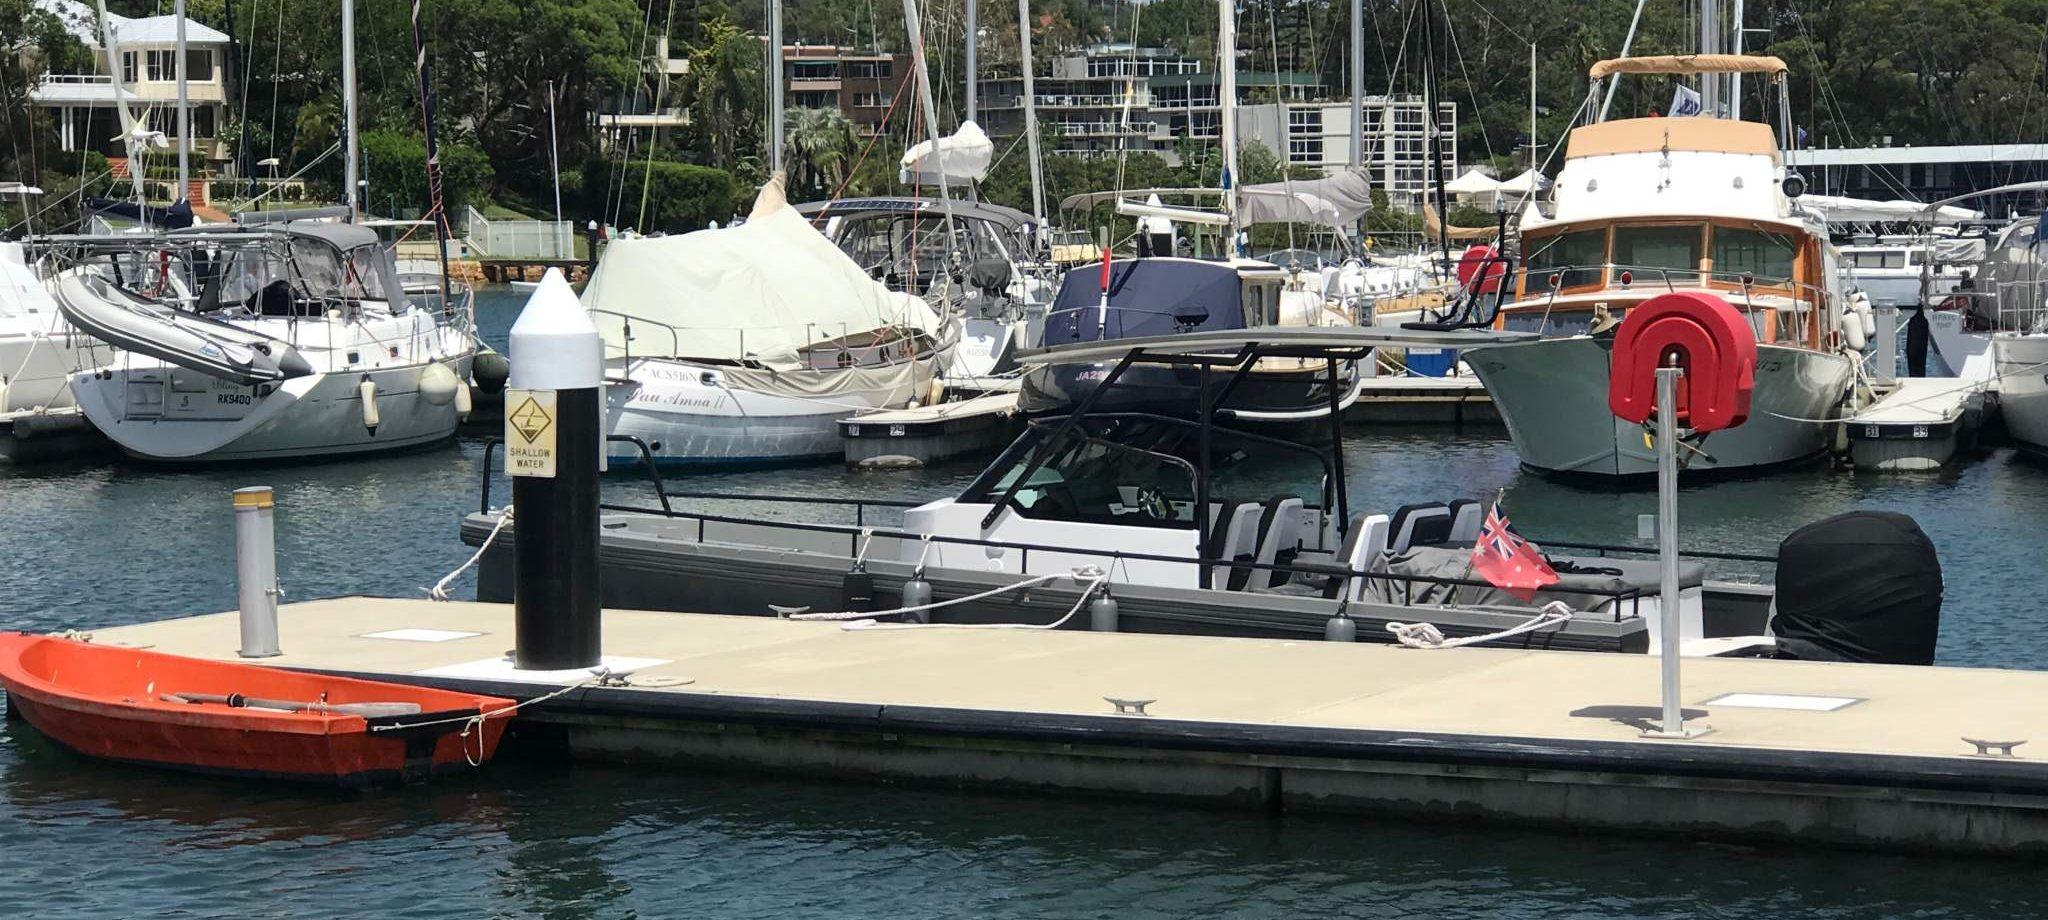 RPAYC- Royal Prince Alfred Yacht Club